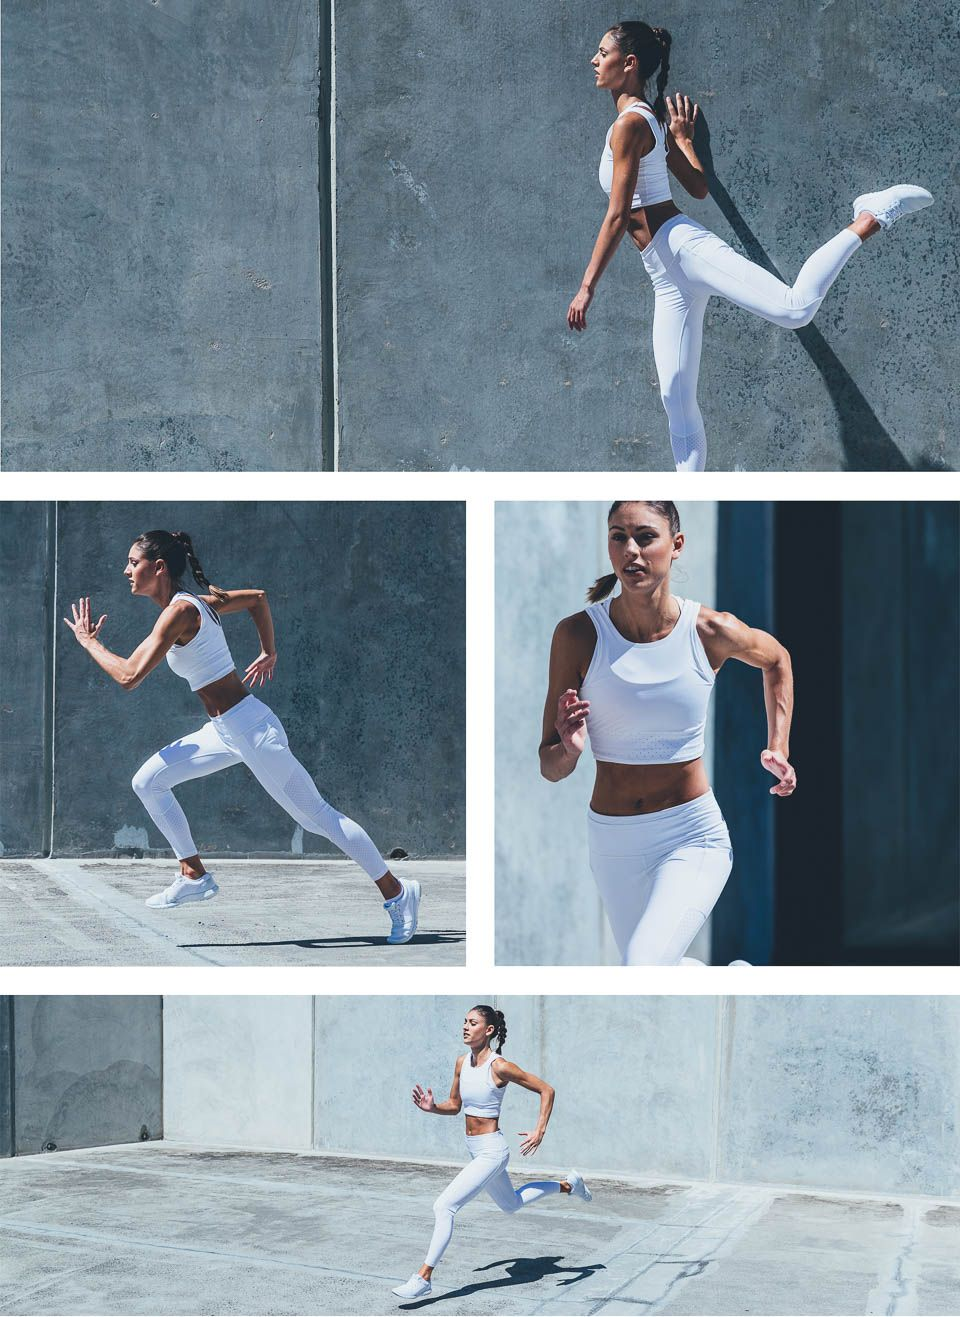 Lulu Web 2017 Q1 Mk Autumn Wk10 W 3674 Mind Over Miles Run Edit 960px 3 Jpg Fitness Lifestyle Photography Fitness Photoshoot Running Photography